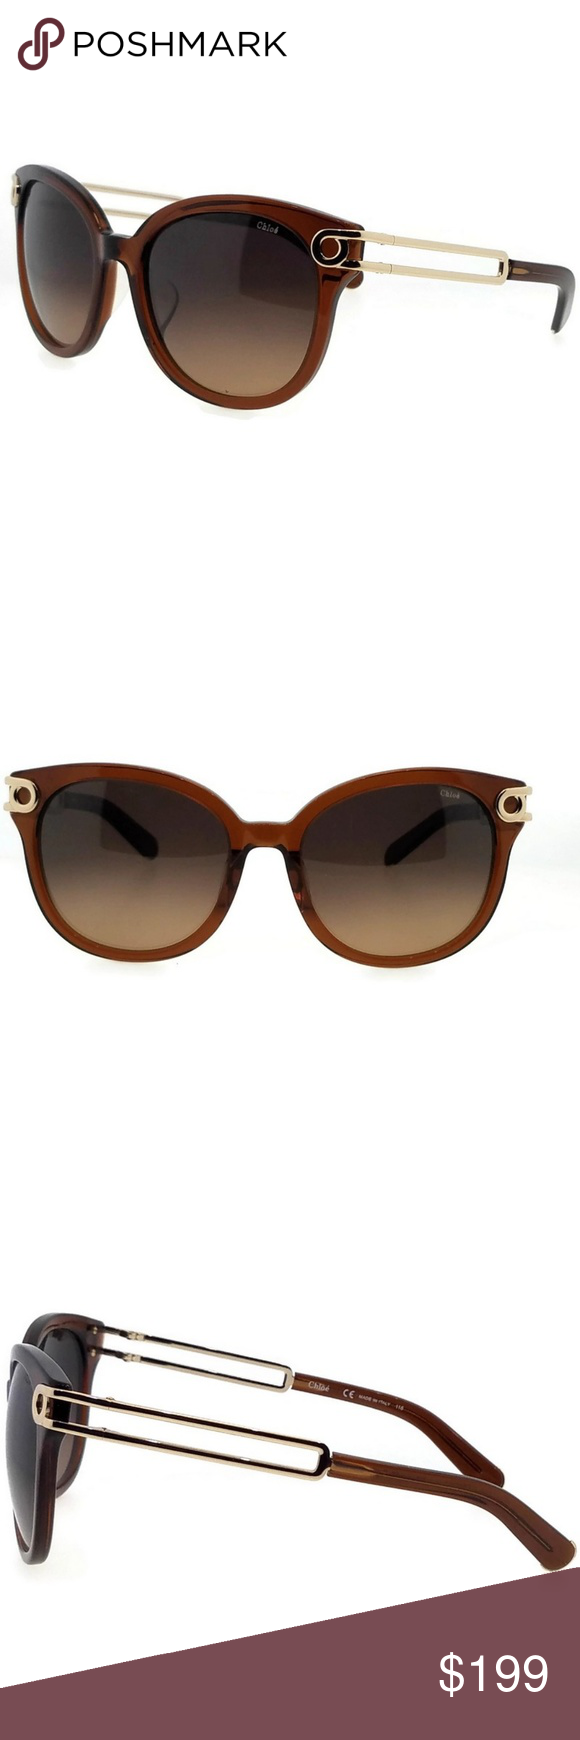 Chloe Ce682sa 210 58 Sunglasses Sunglasses Sunglasses Accessories Chloe